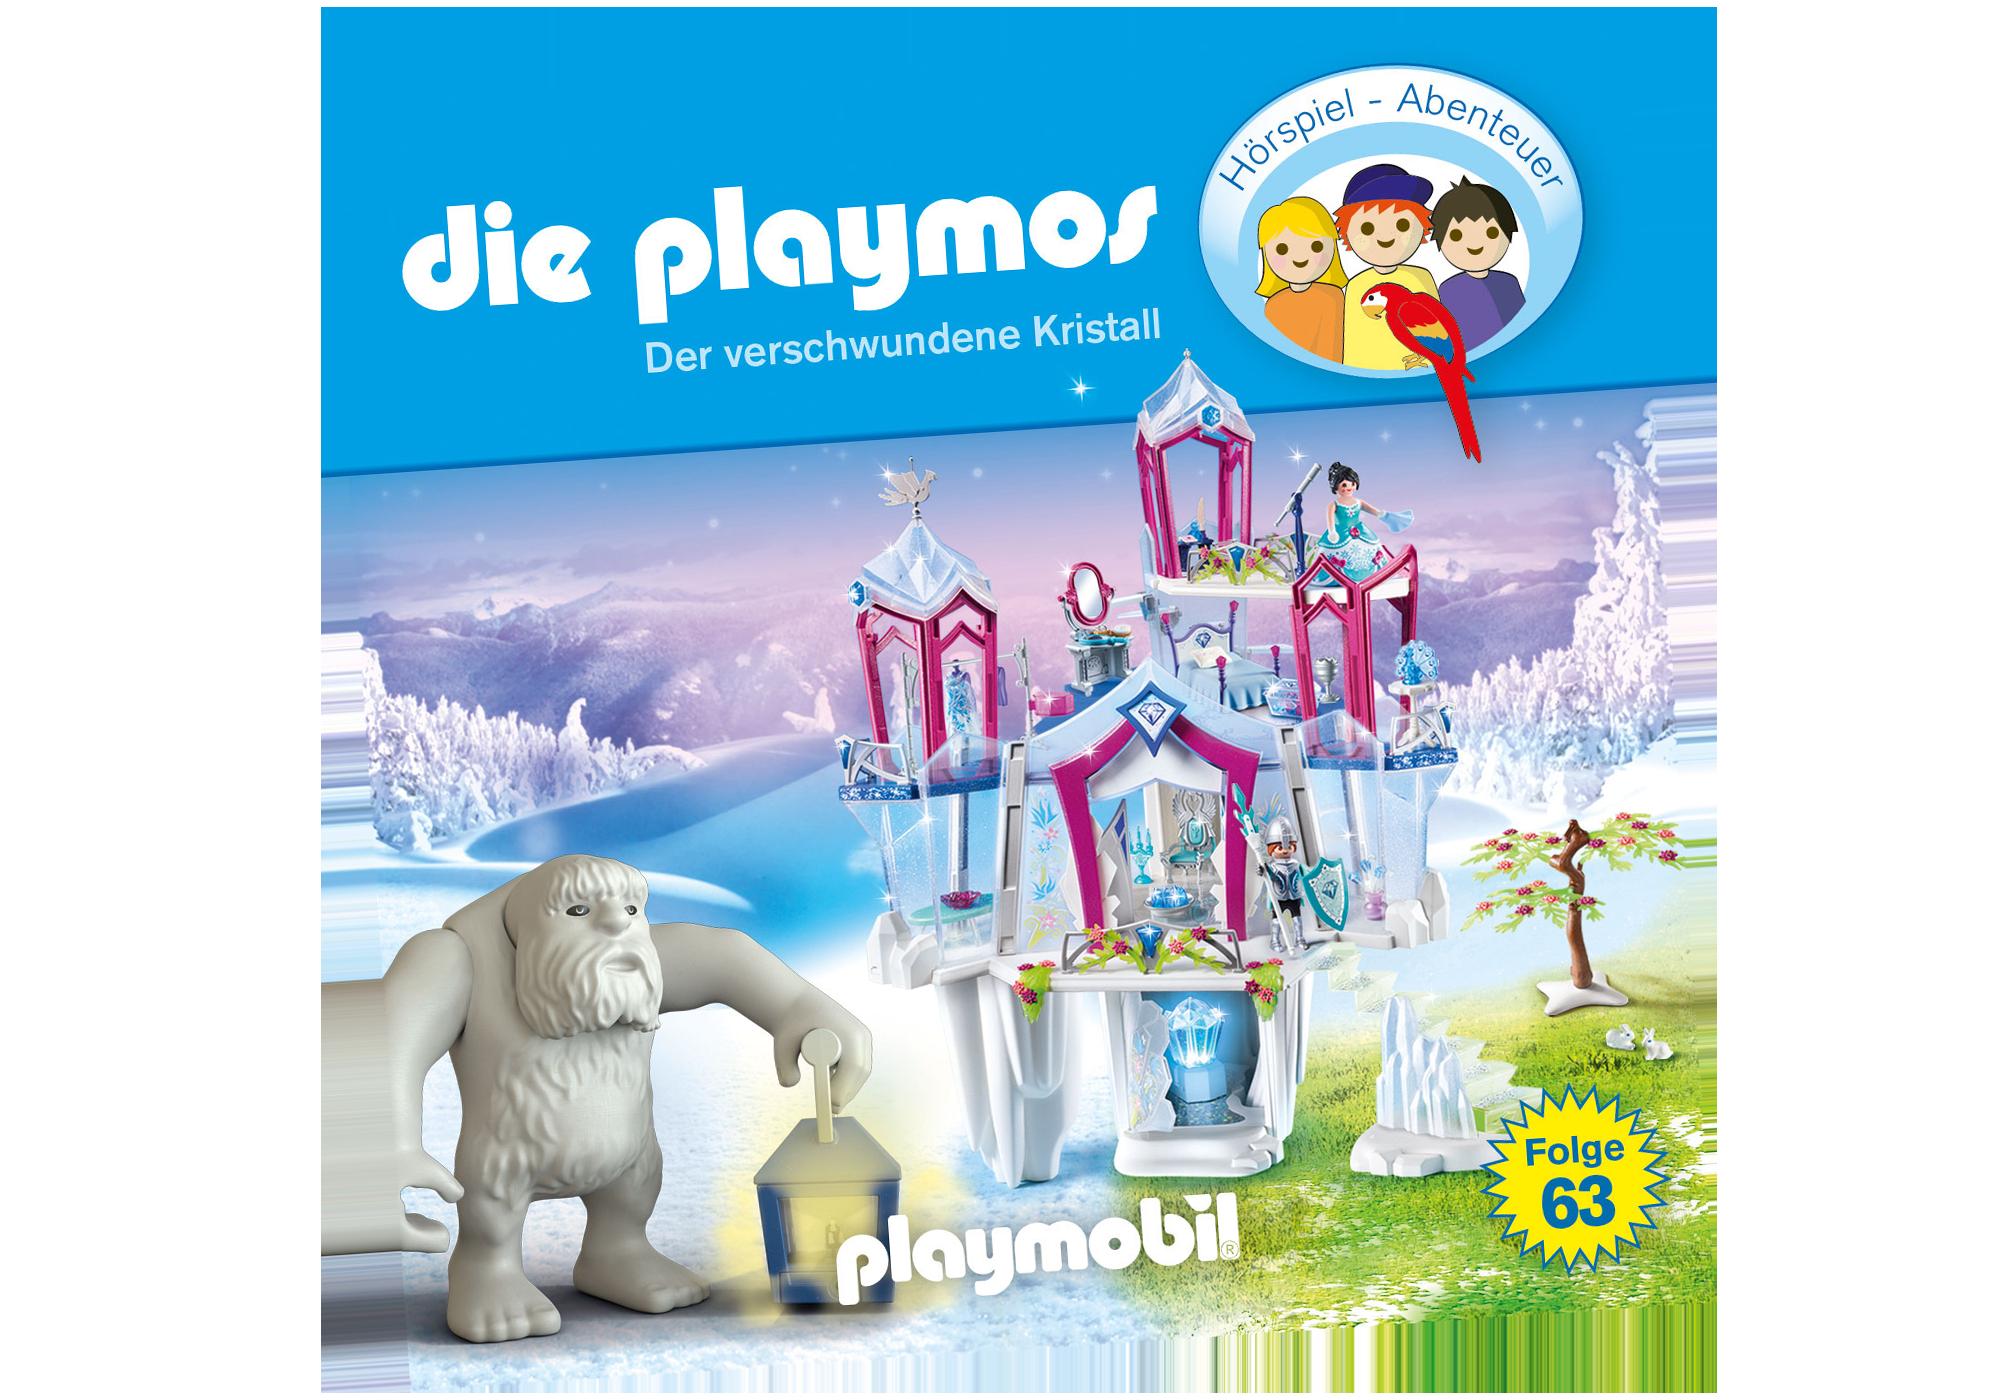 http://media.playmobil.com/i/playmobil/80085_product_detail